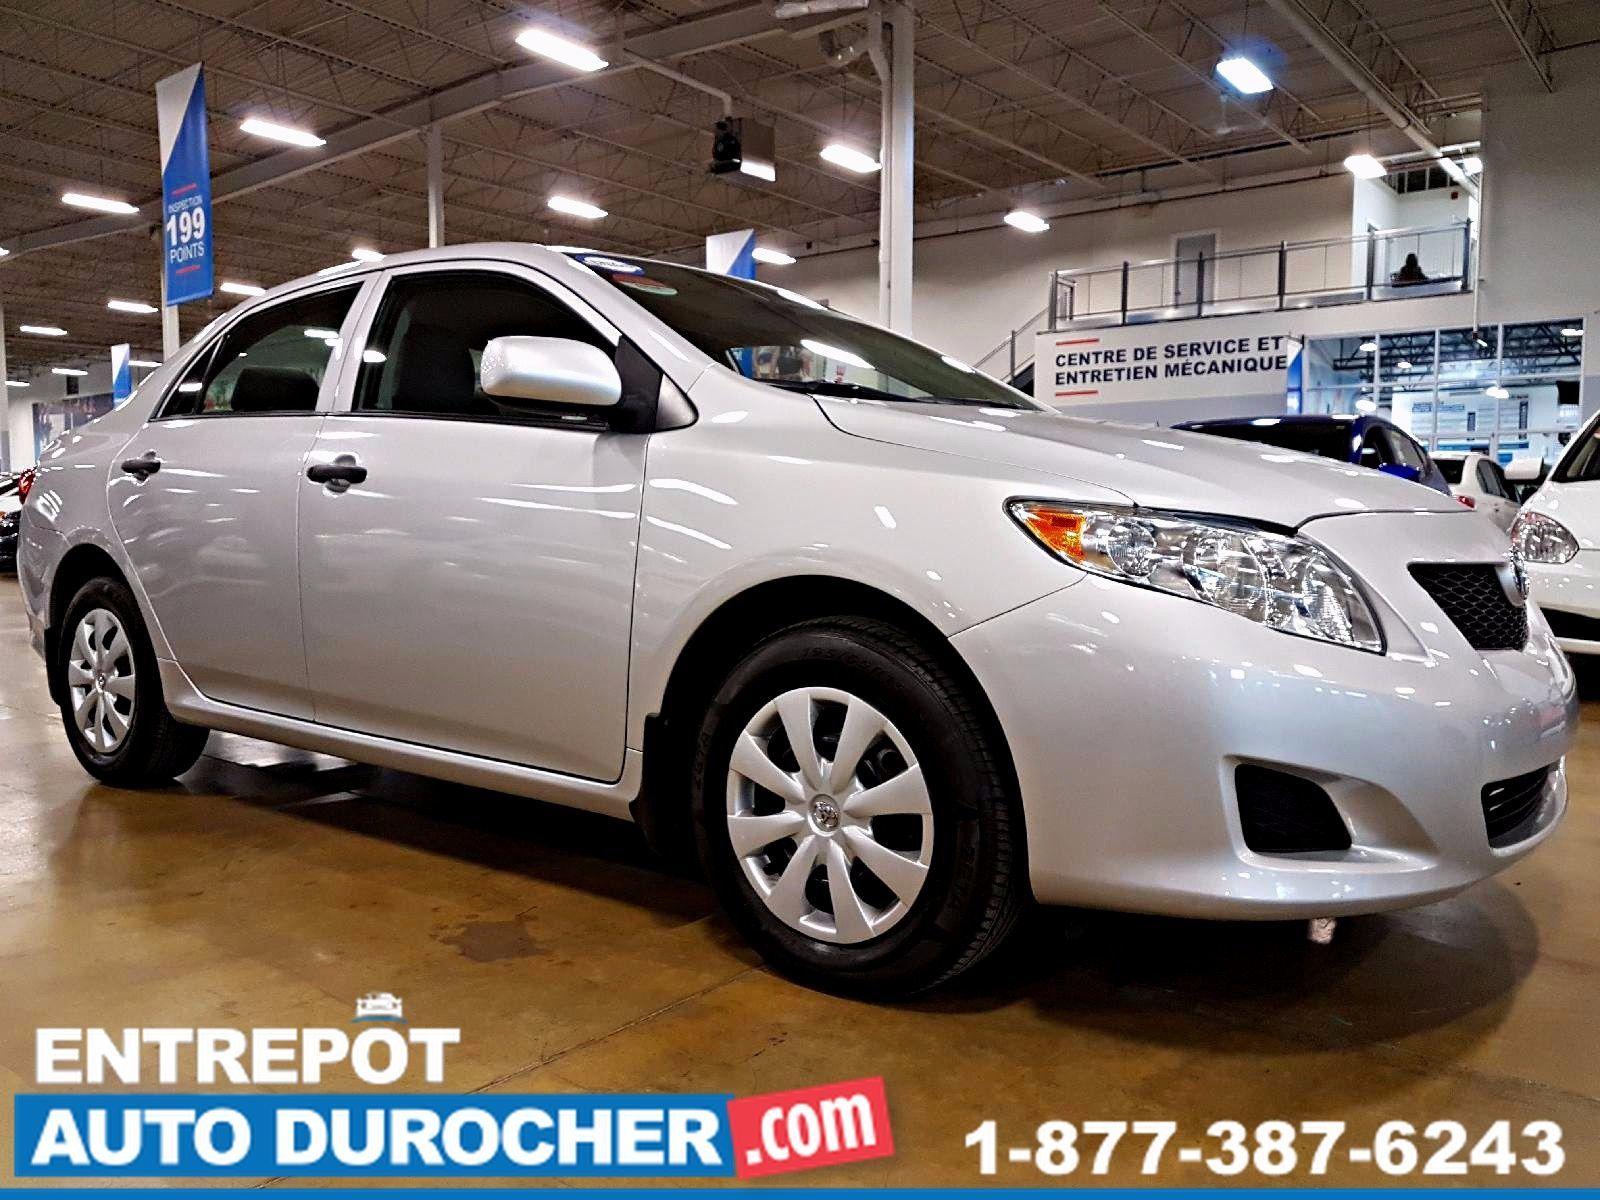 2010 Toyota Corolla AUTOMATIQUE